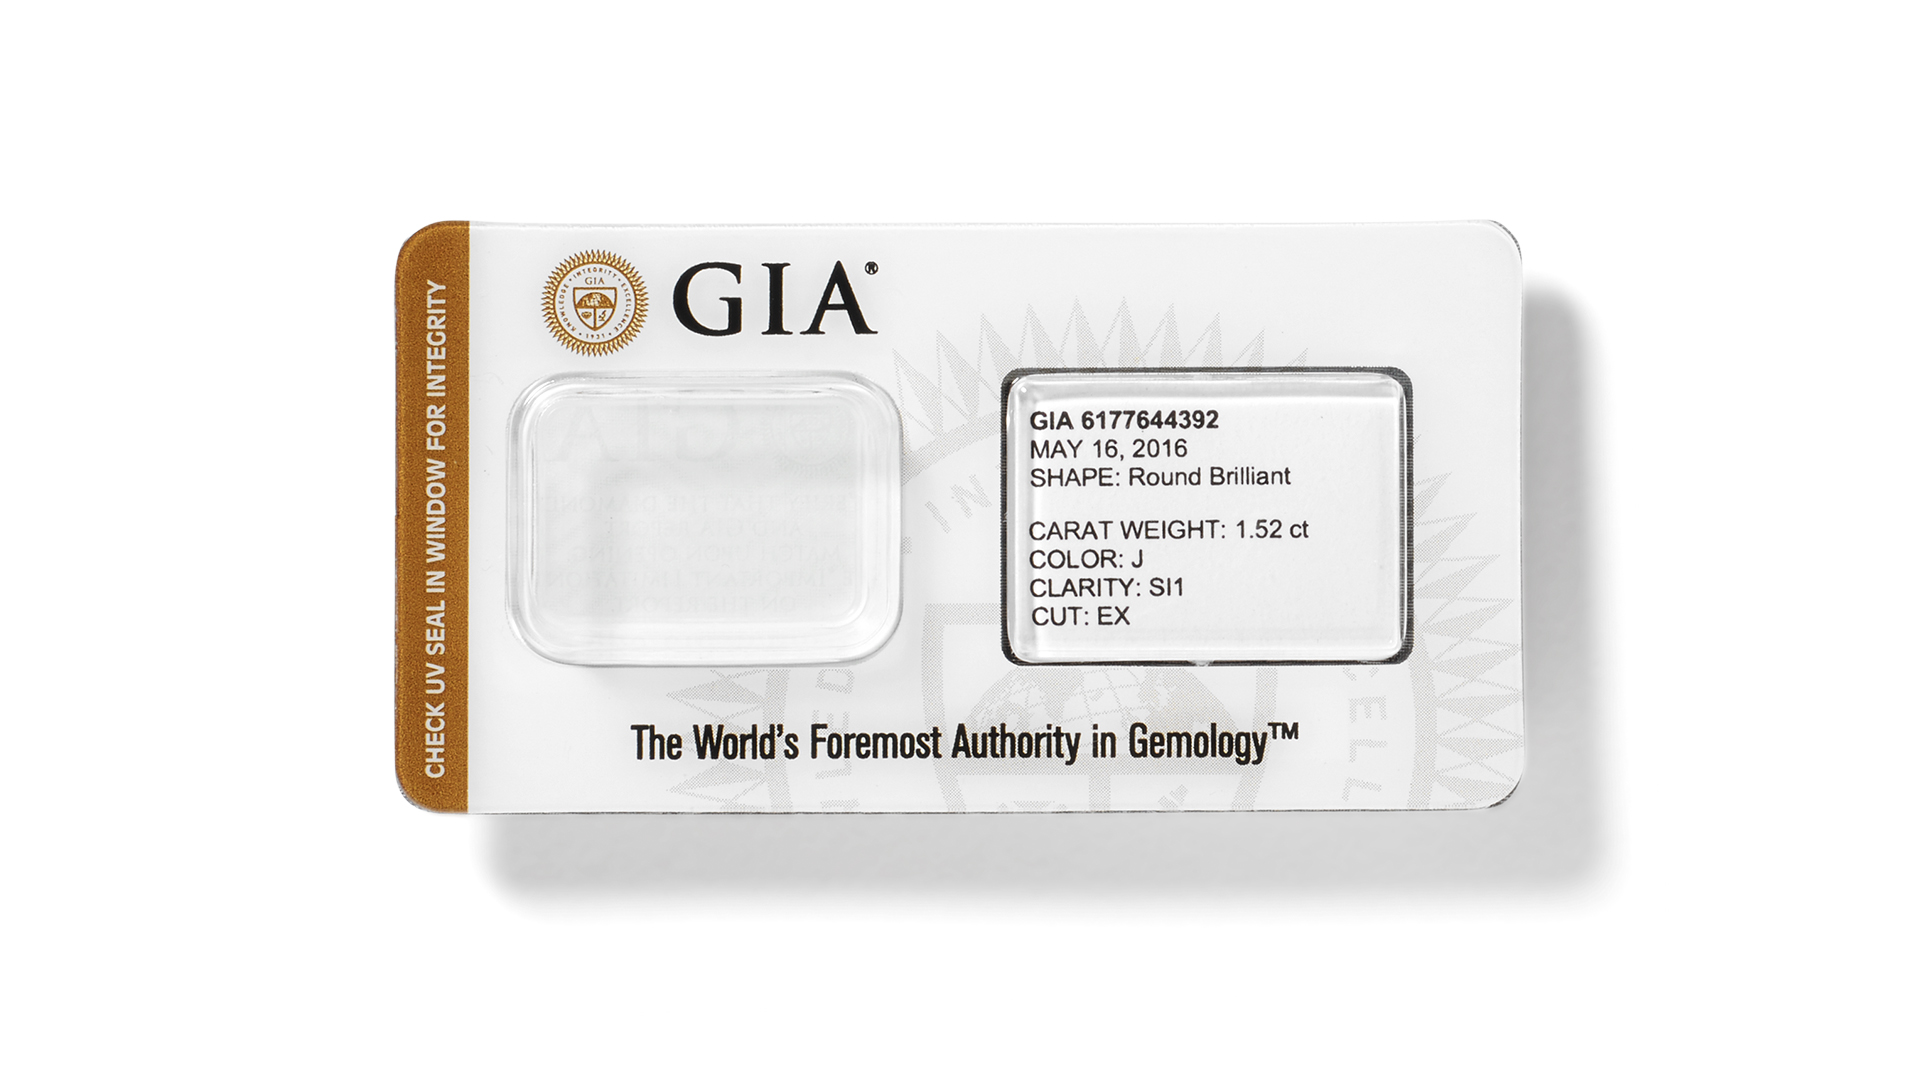 GIA 钻石密封服务的样品 — 前部附有关键分级详情的安全的防篡改密封包装。